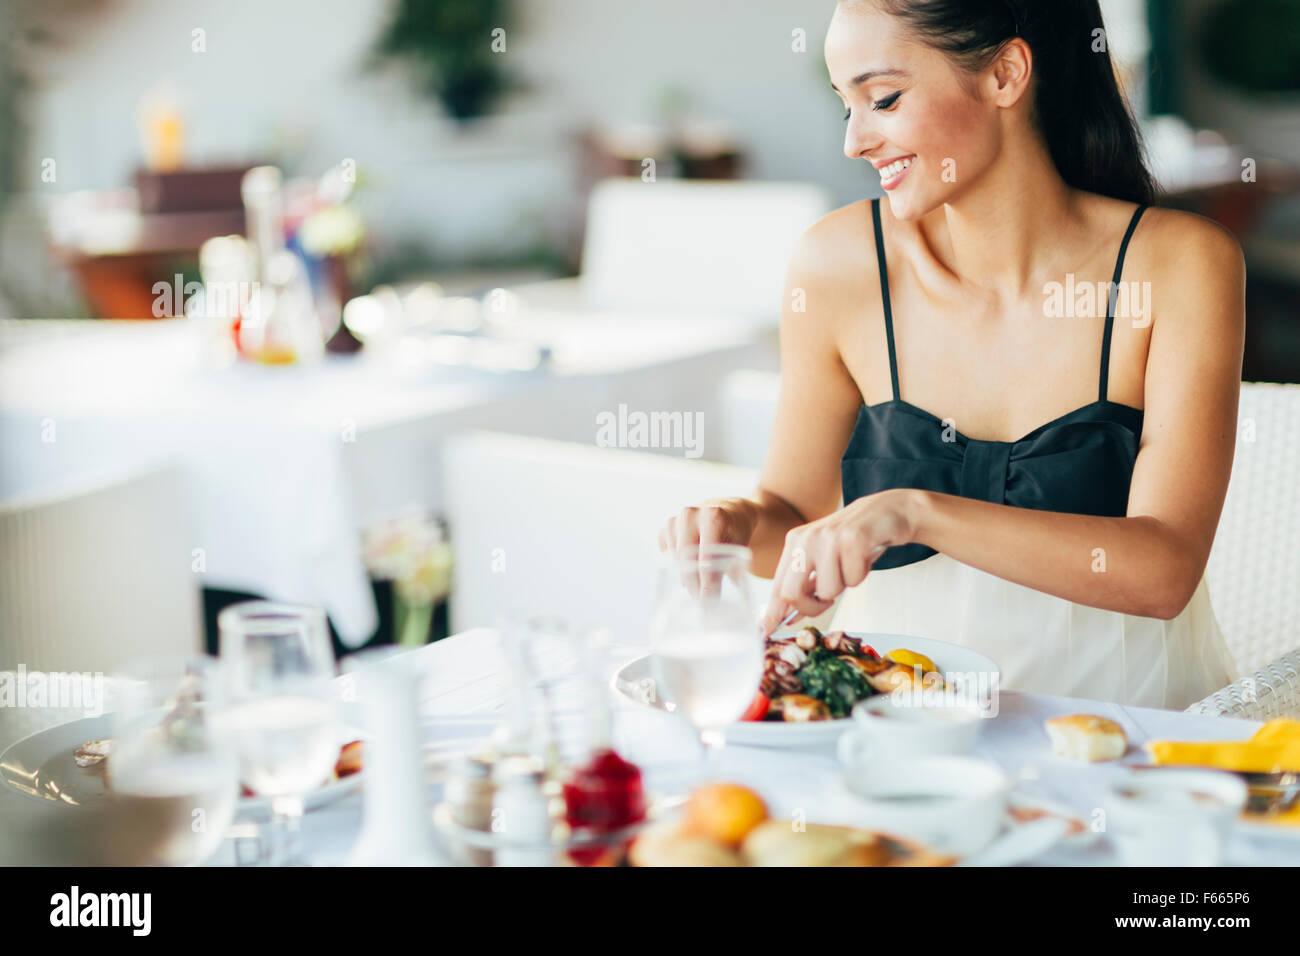 Attraktive Frau Essen im Restaurant im freien Stockbild